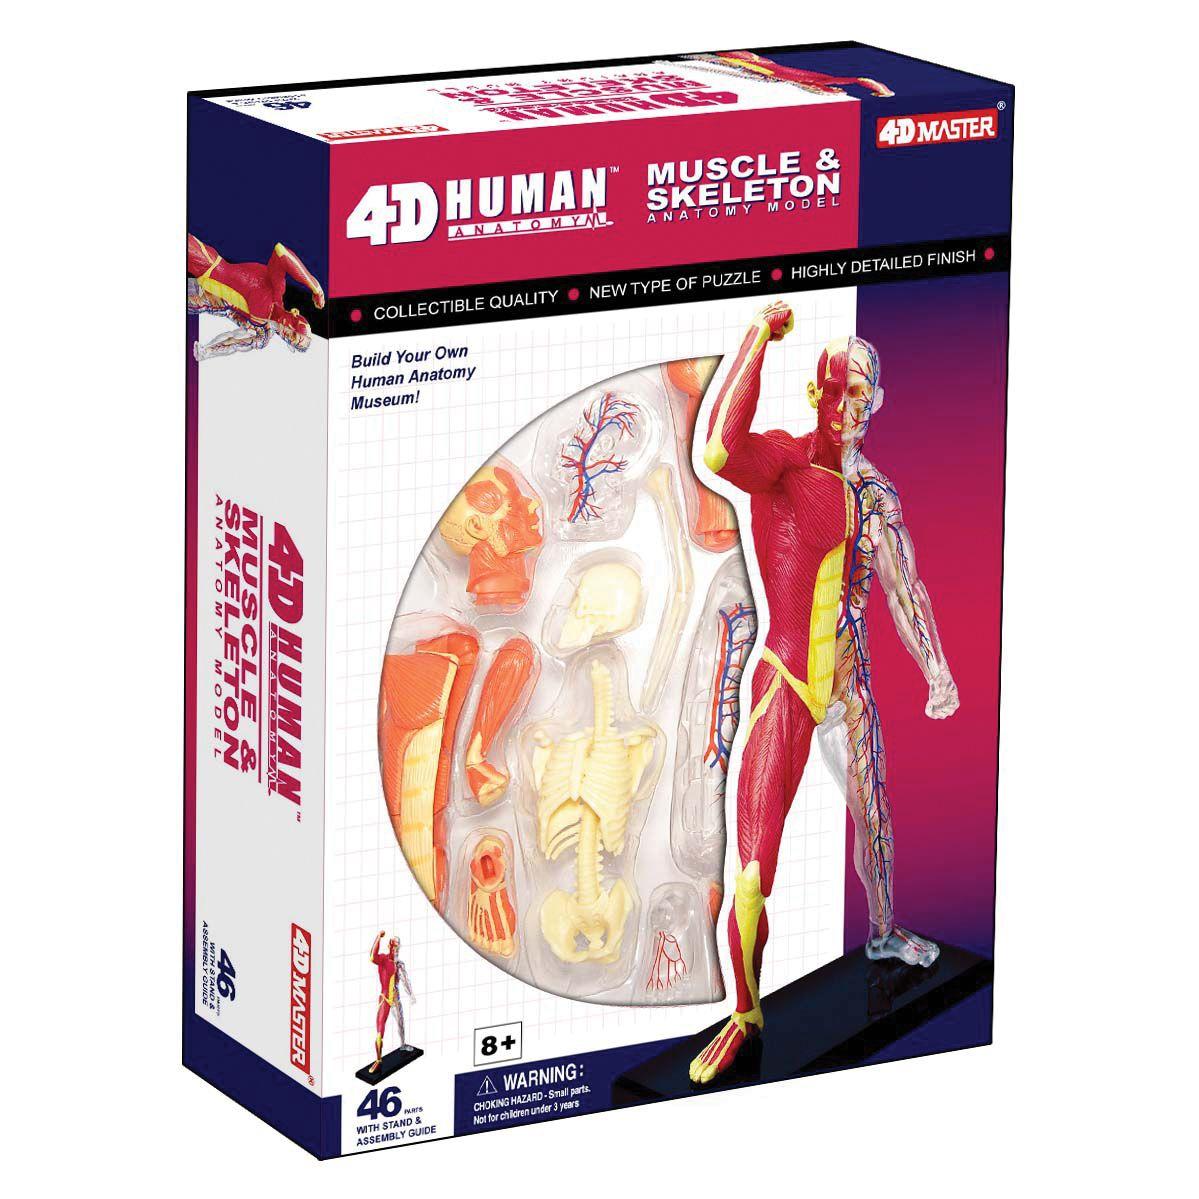 4d Human Anatomy Muscle Skeleton Model In 2020 Human Anatomy